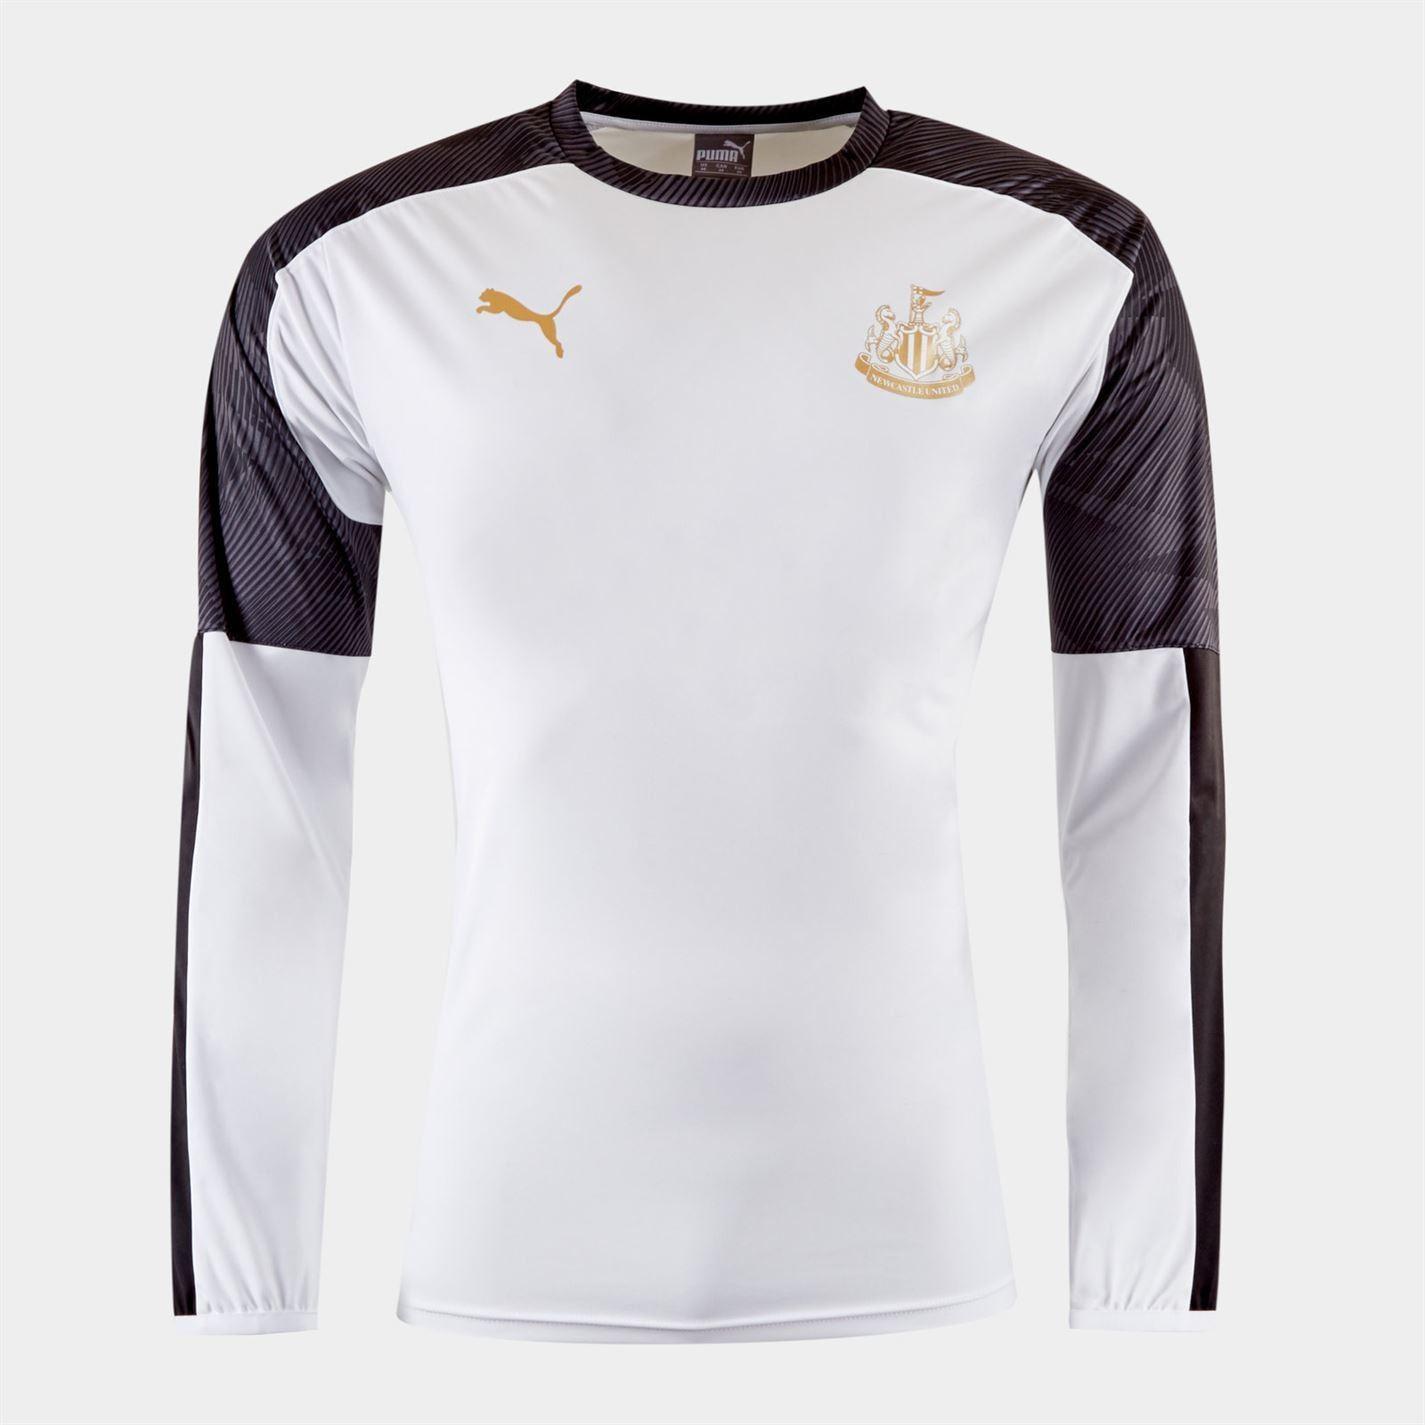 Puma-Newcastle-United-T-Shirt-Junior-Football-Boys-Soccer-Fan-Jersey-Drill-Top thumbnail 7